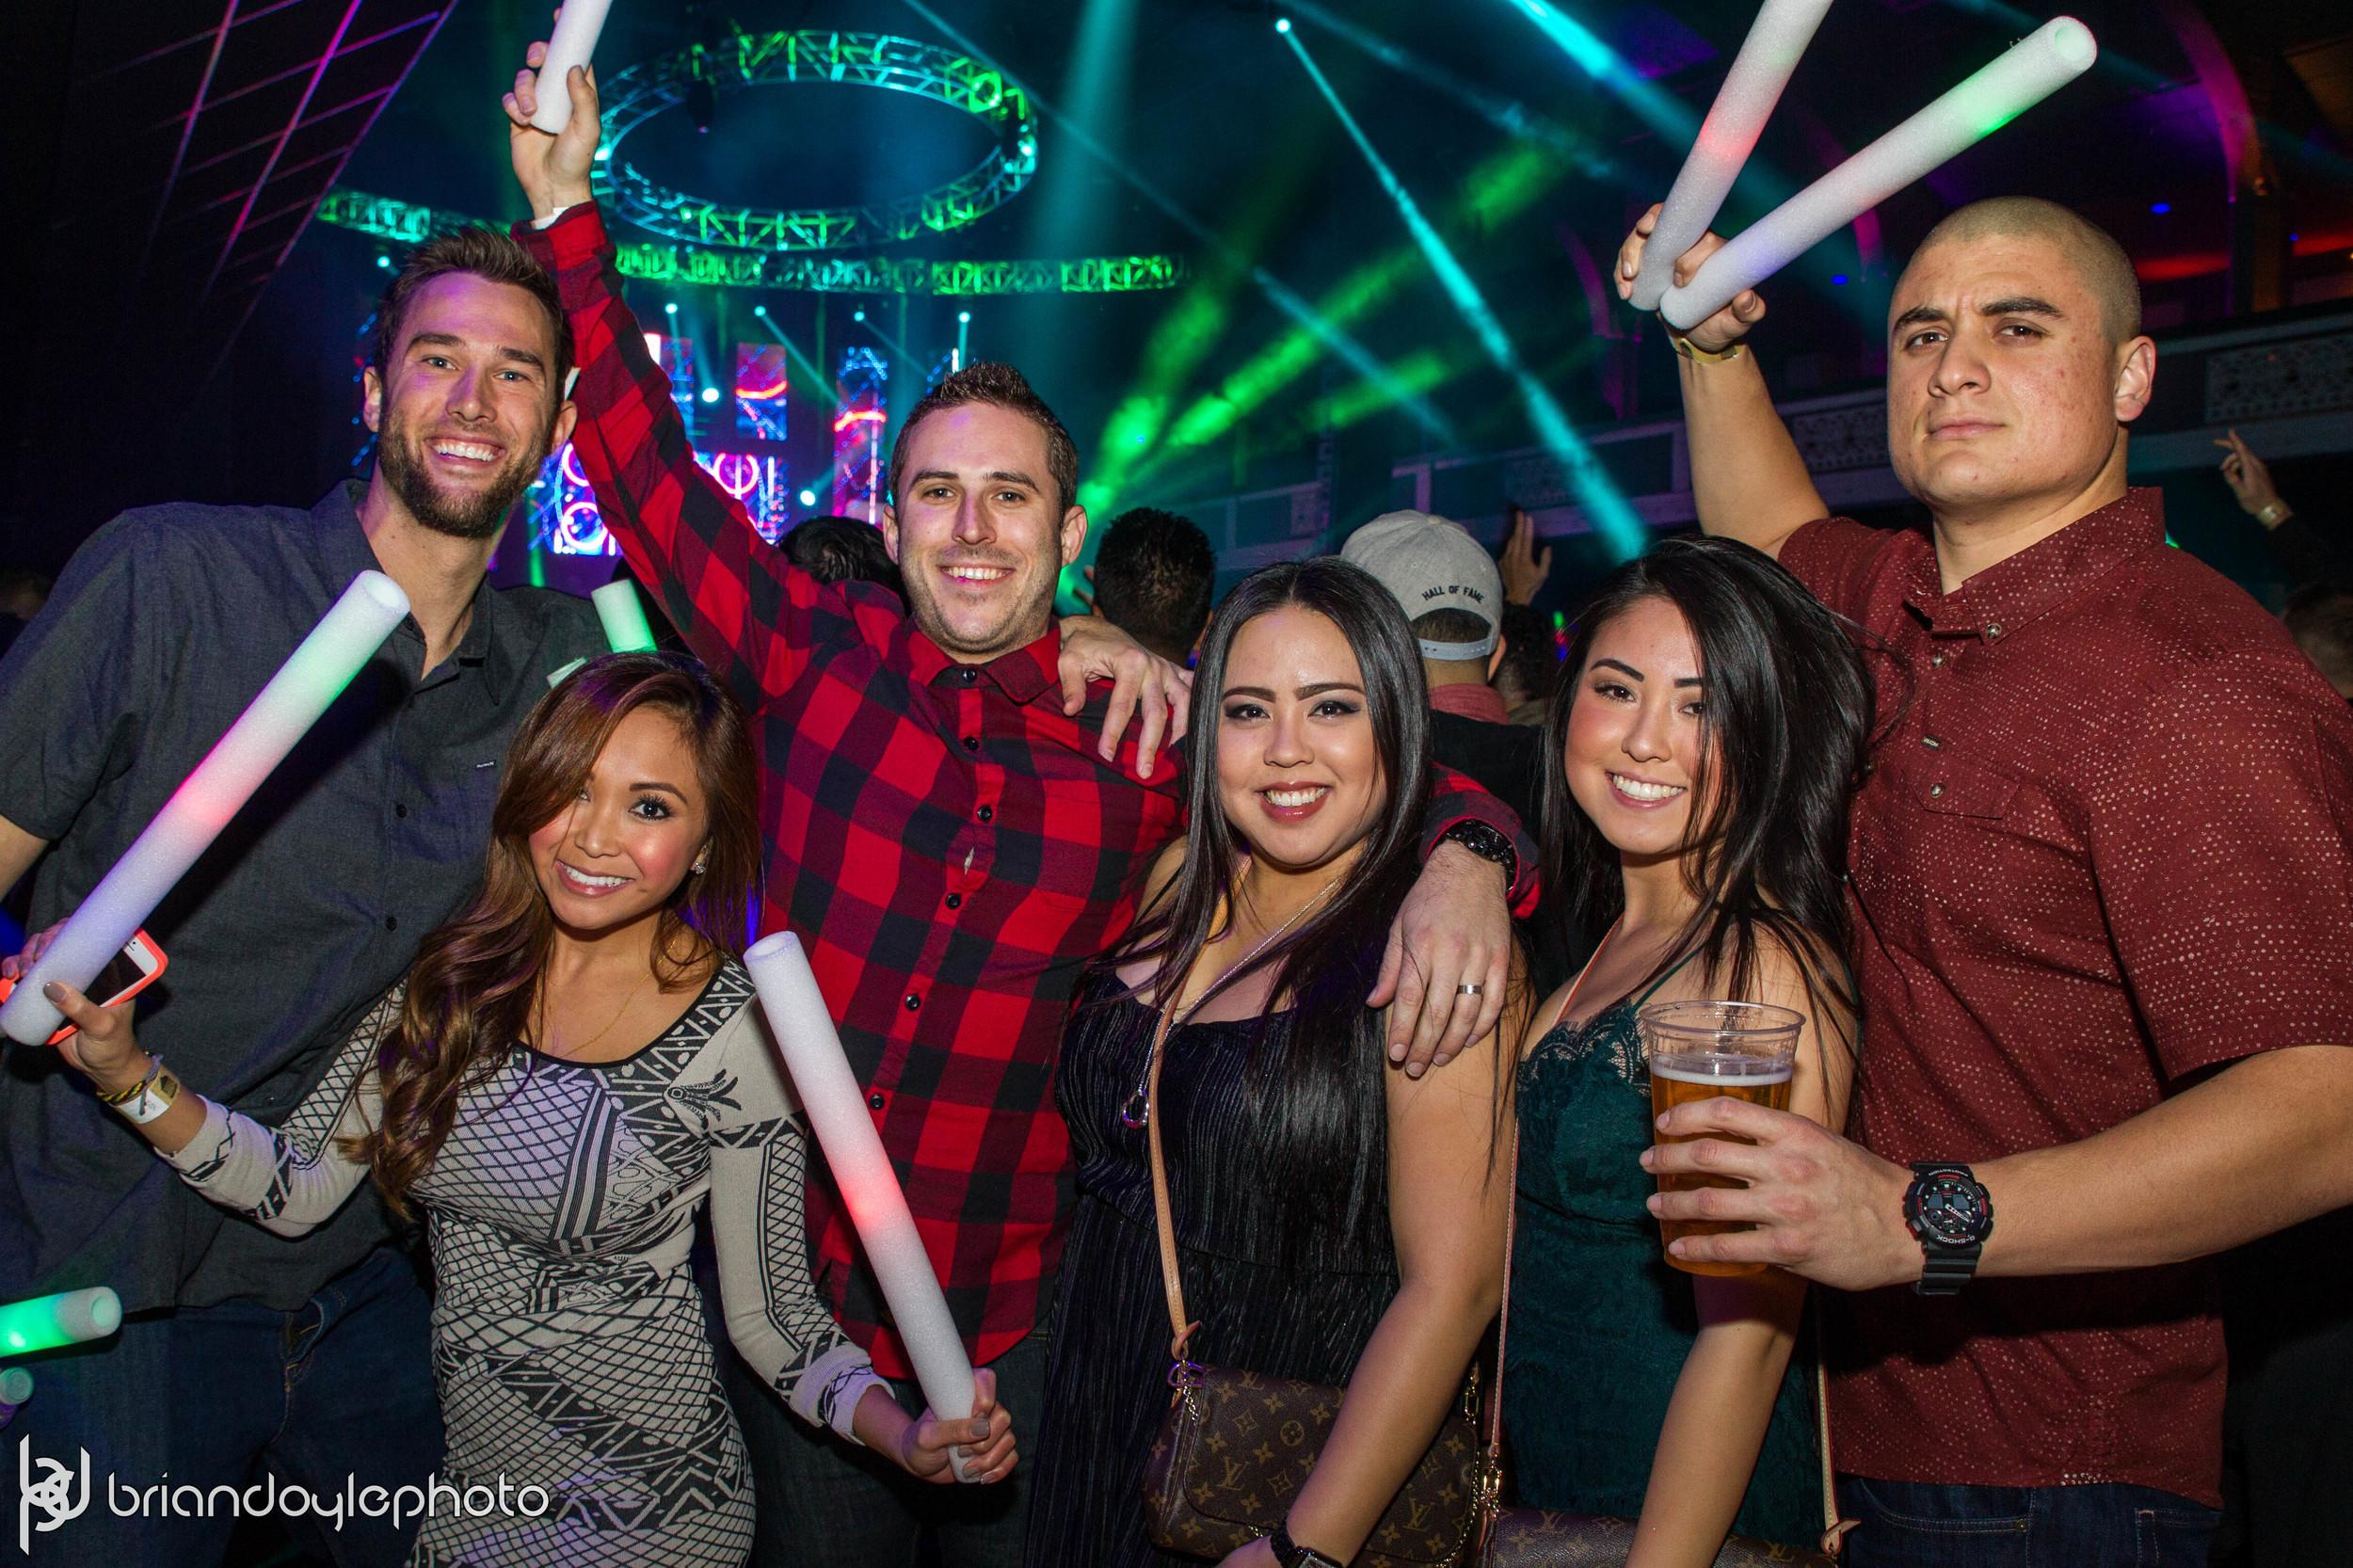 OMFG NYE 2015 LA - Eric Prydz, Henry Fong, Alex Metric, Botnek, Anna Lunoe, Wiwek 2014.12.31-7715.jpg